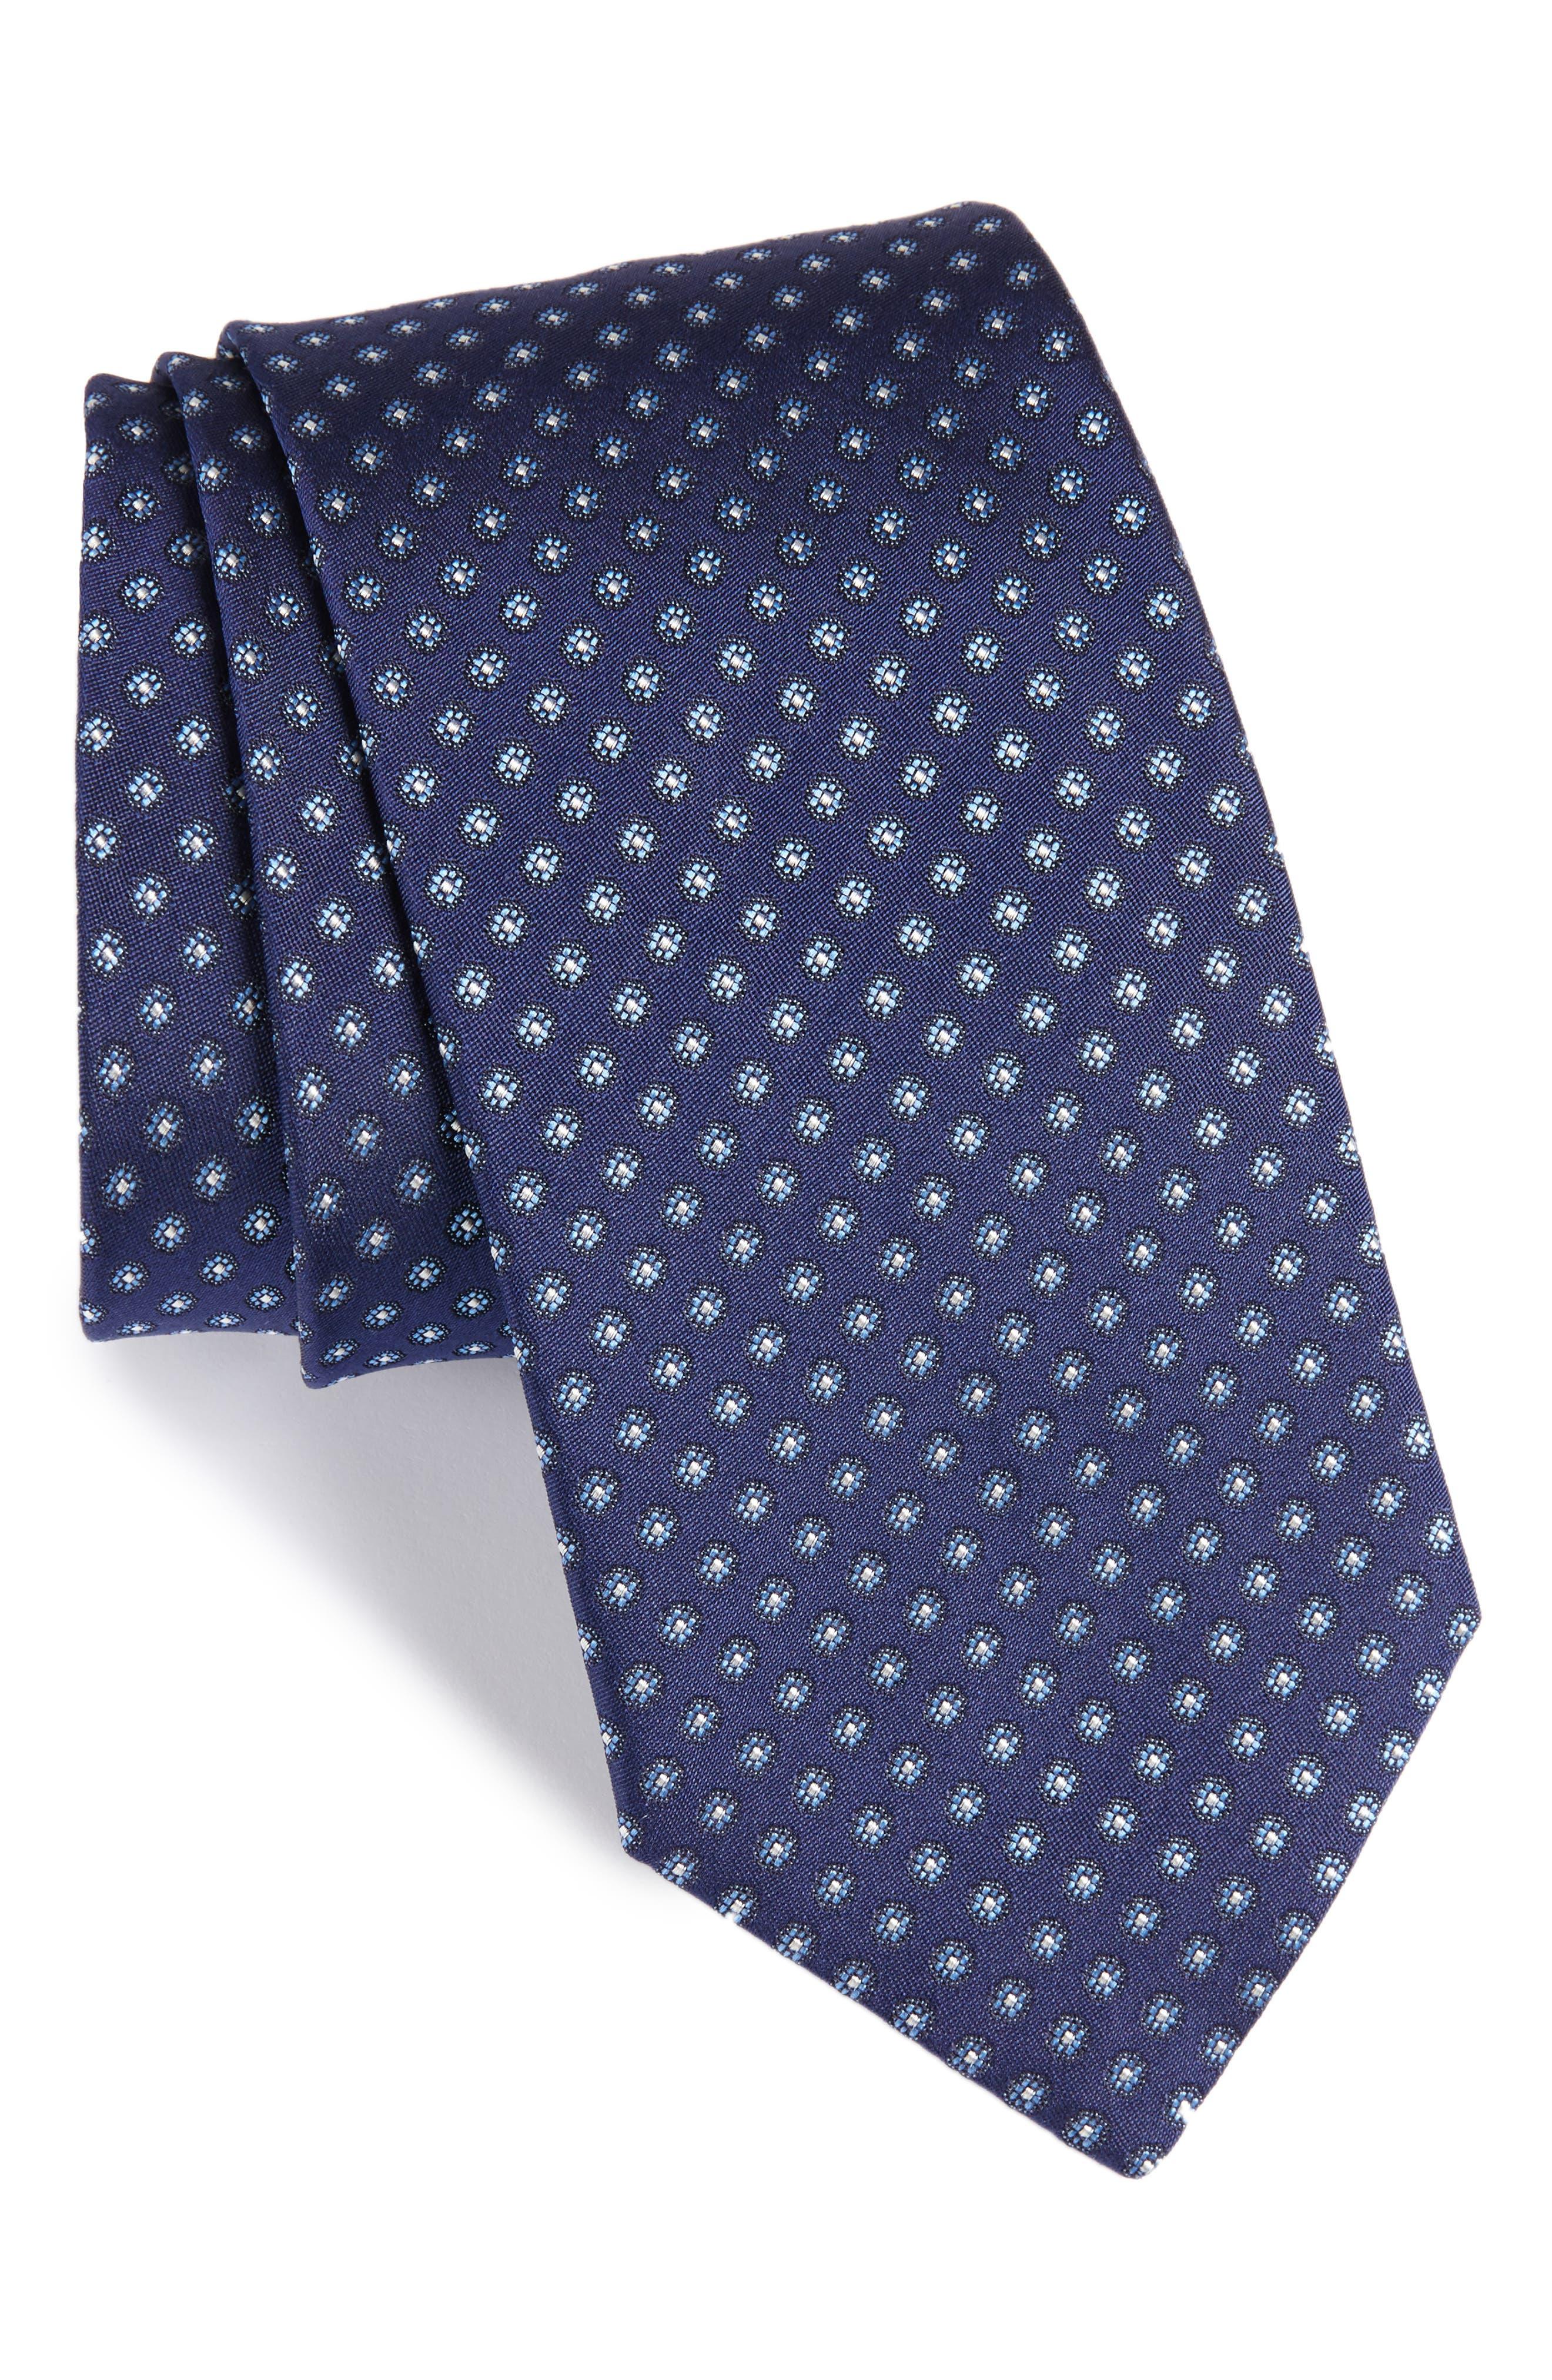 Floral Silk Tie,                             Main thumbnail 1, color,                             NAVY/ GREY